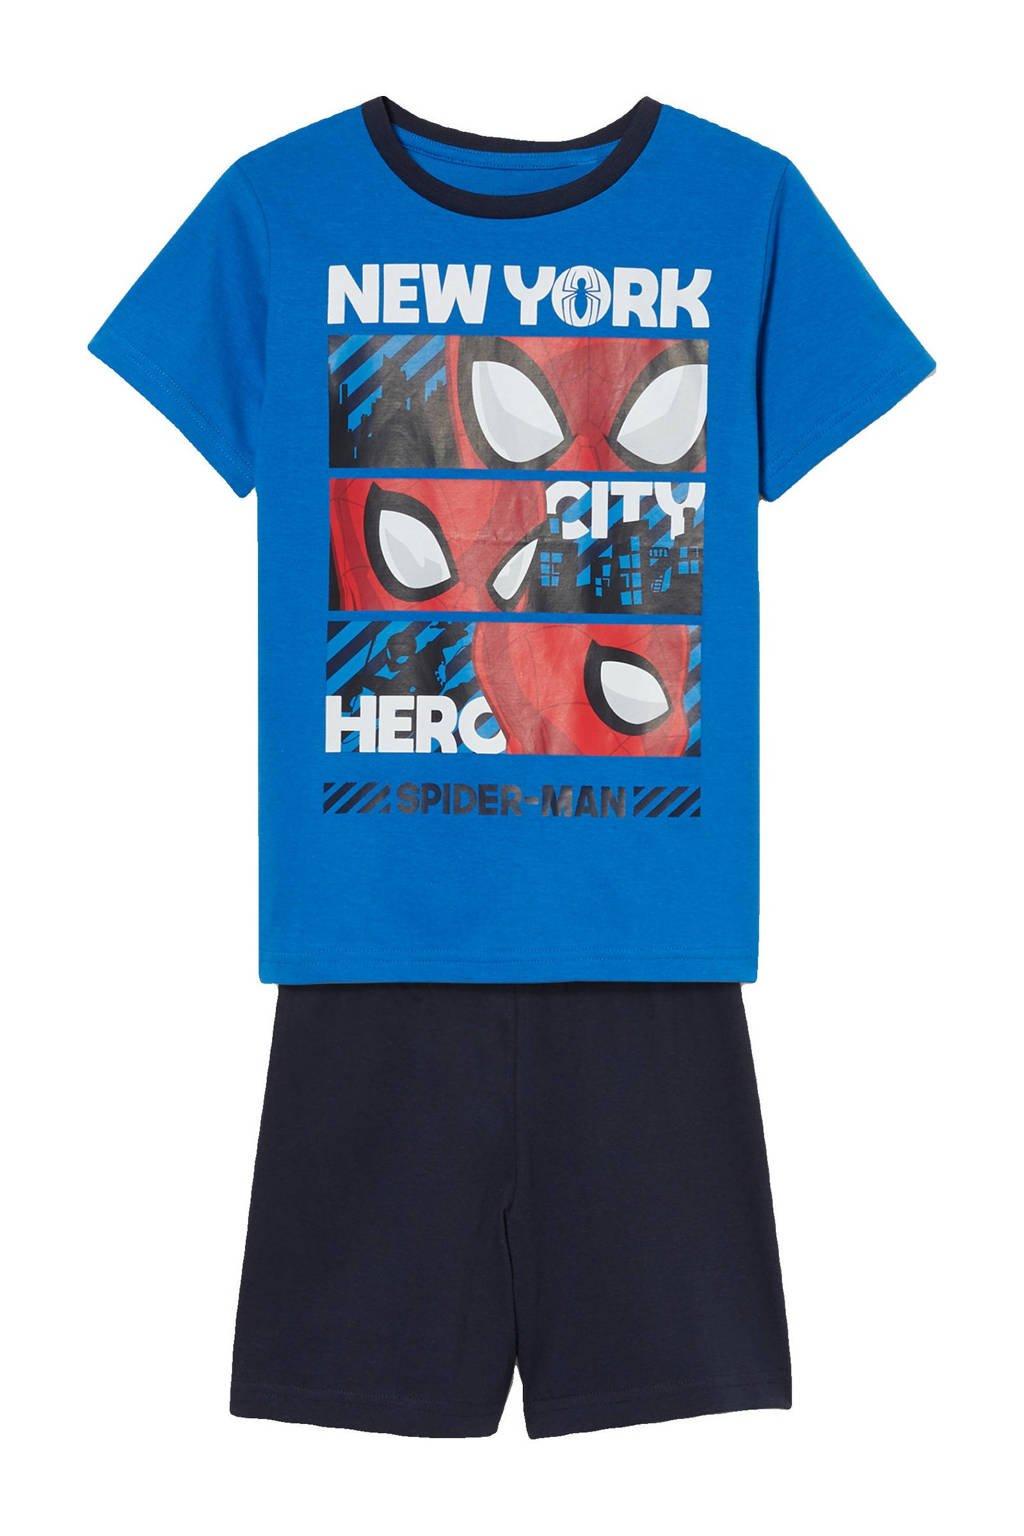 C&A Spiderman   spiderman shortama blauw/donkerblauw/wit, Blauw/donkerblauw/wit